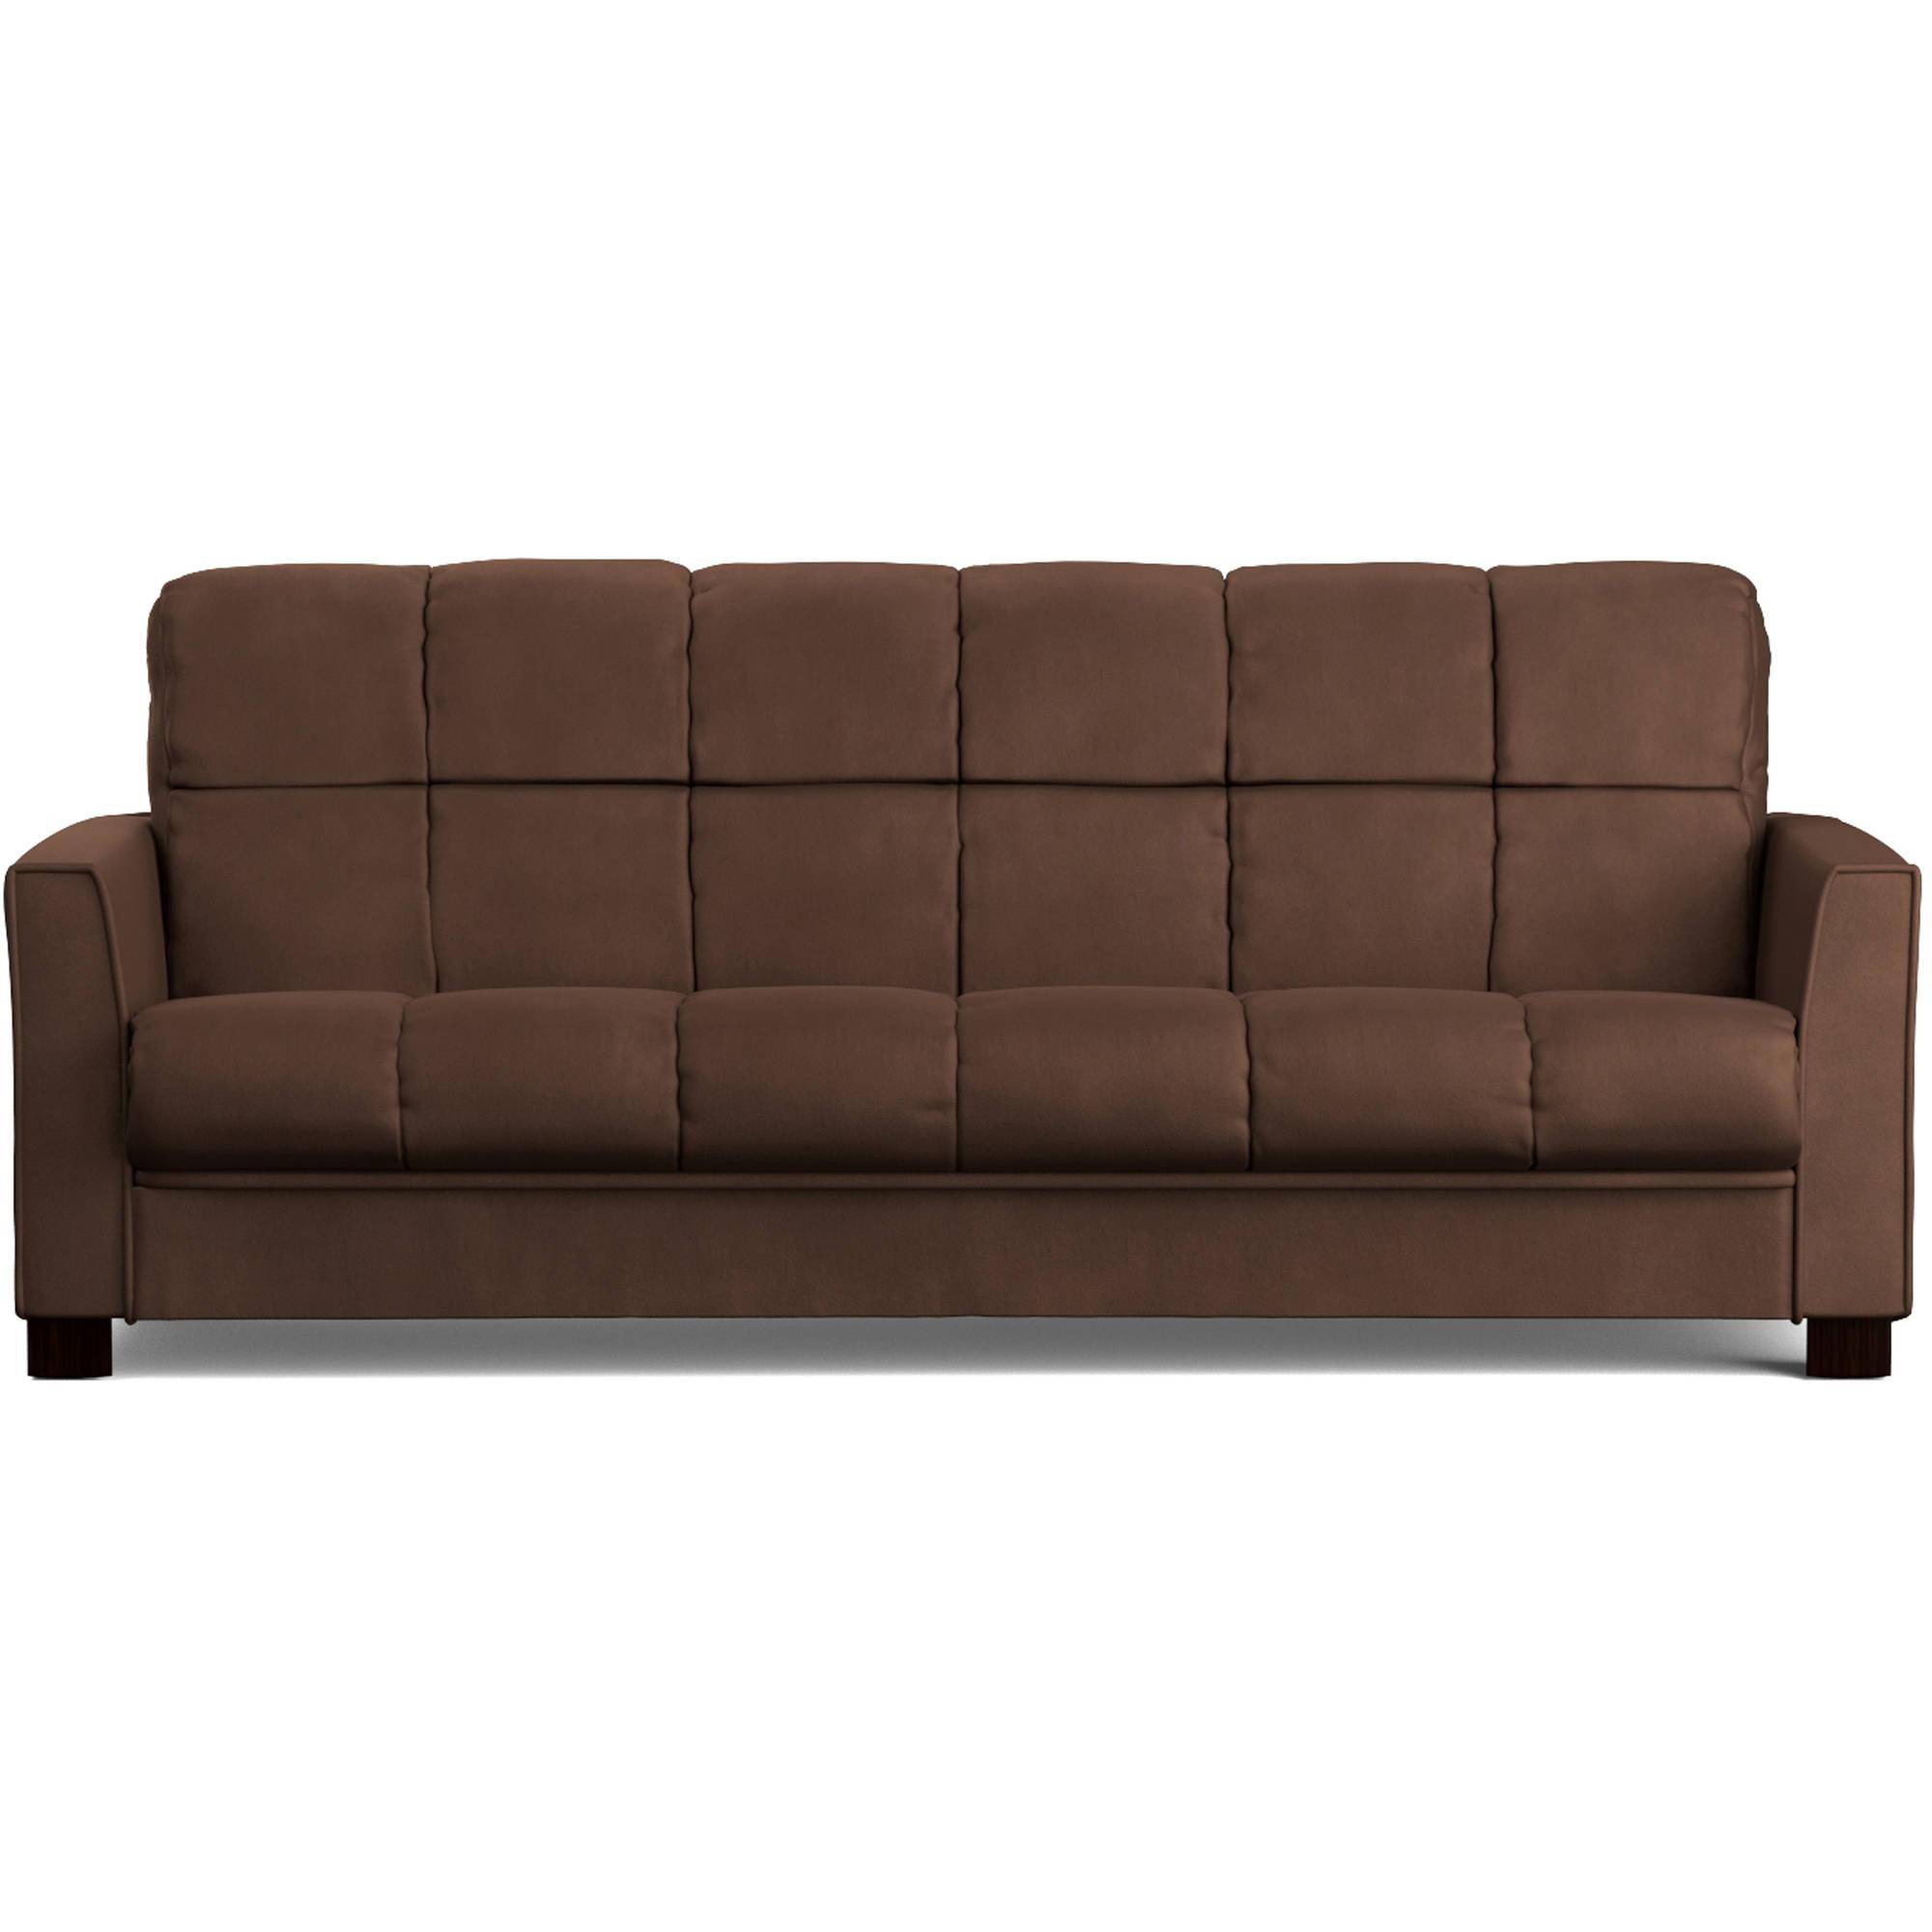 How to futon sofa sleeper